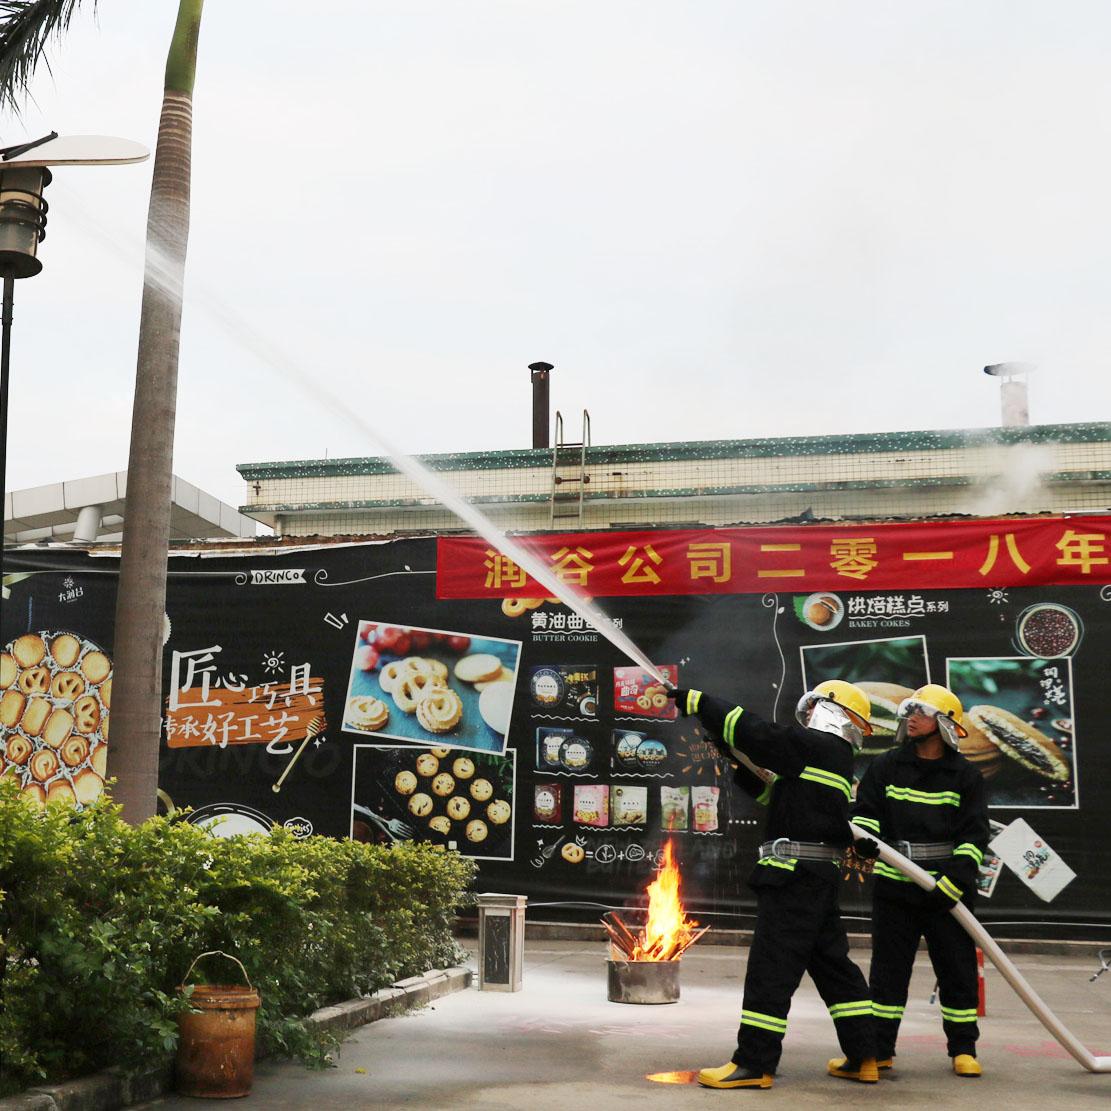 Regular fire drills and seminars